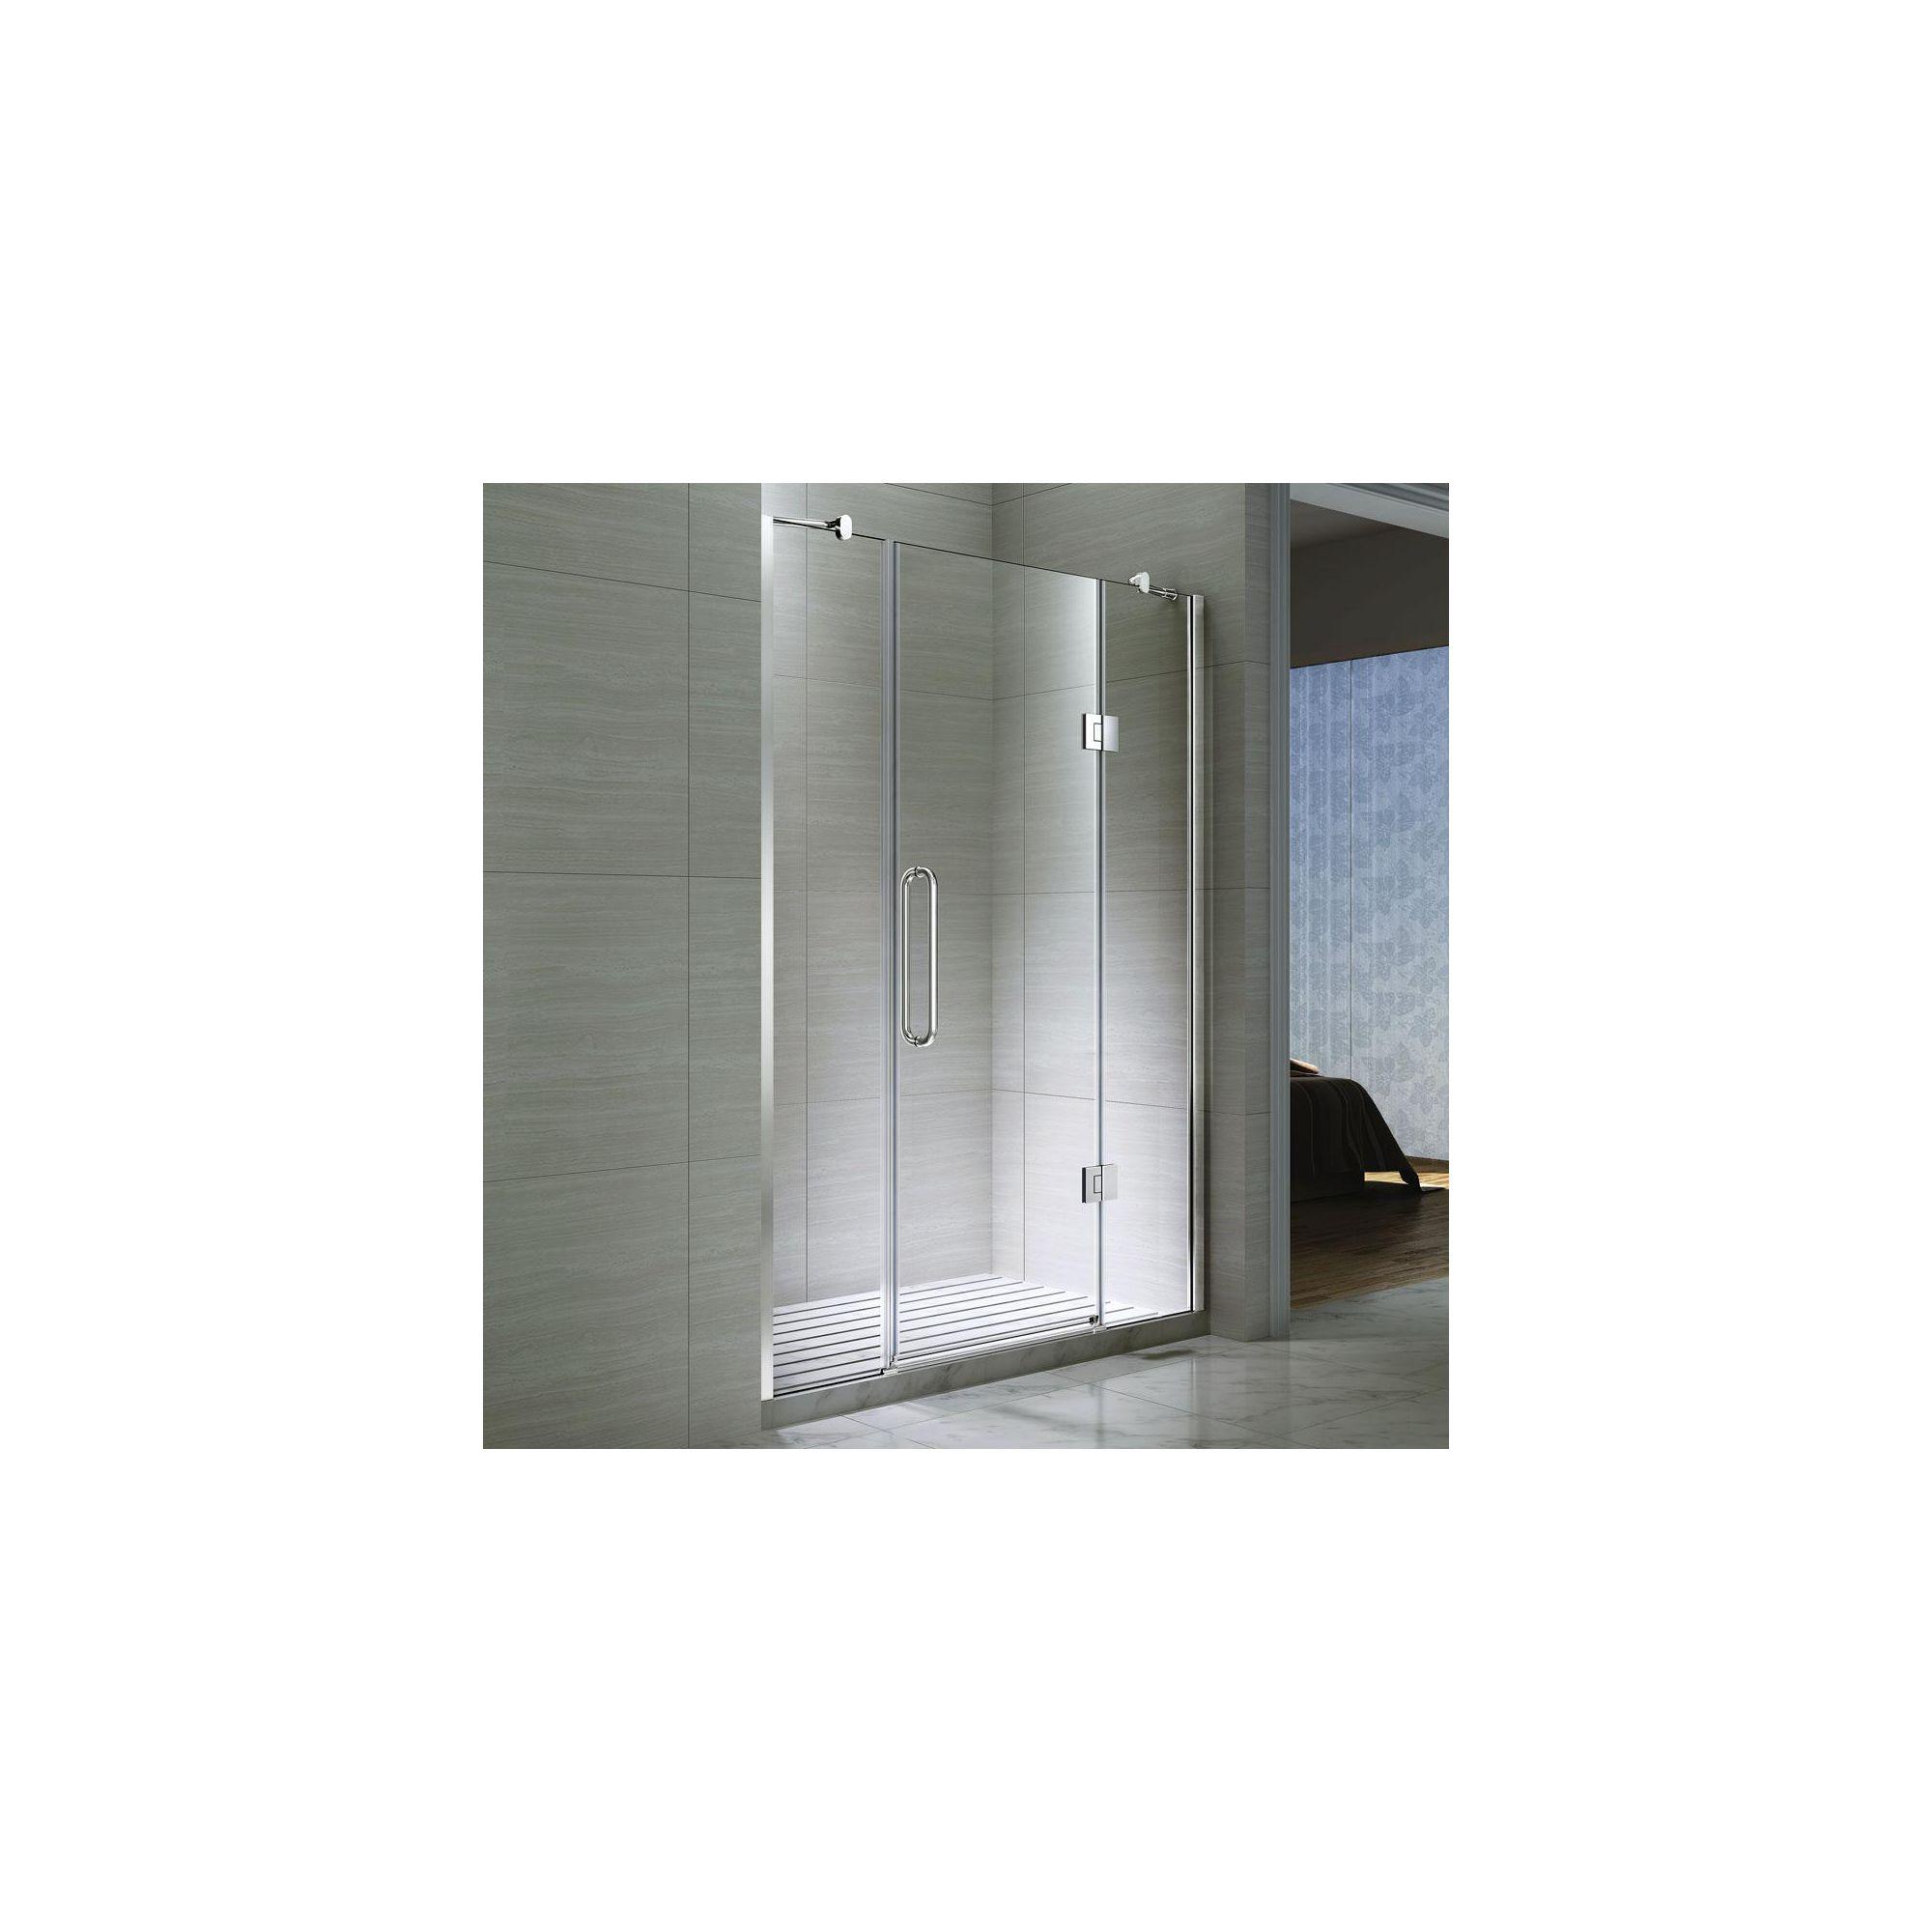 Desire Ten Double Inline Hinged Shower Door, 1600mm Wide, Semi-Frameless, 10mm Glass at Tesco Direct